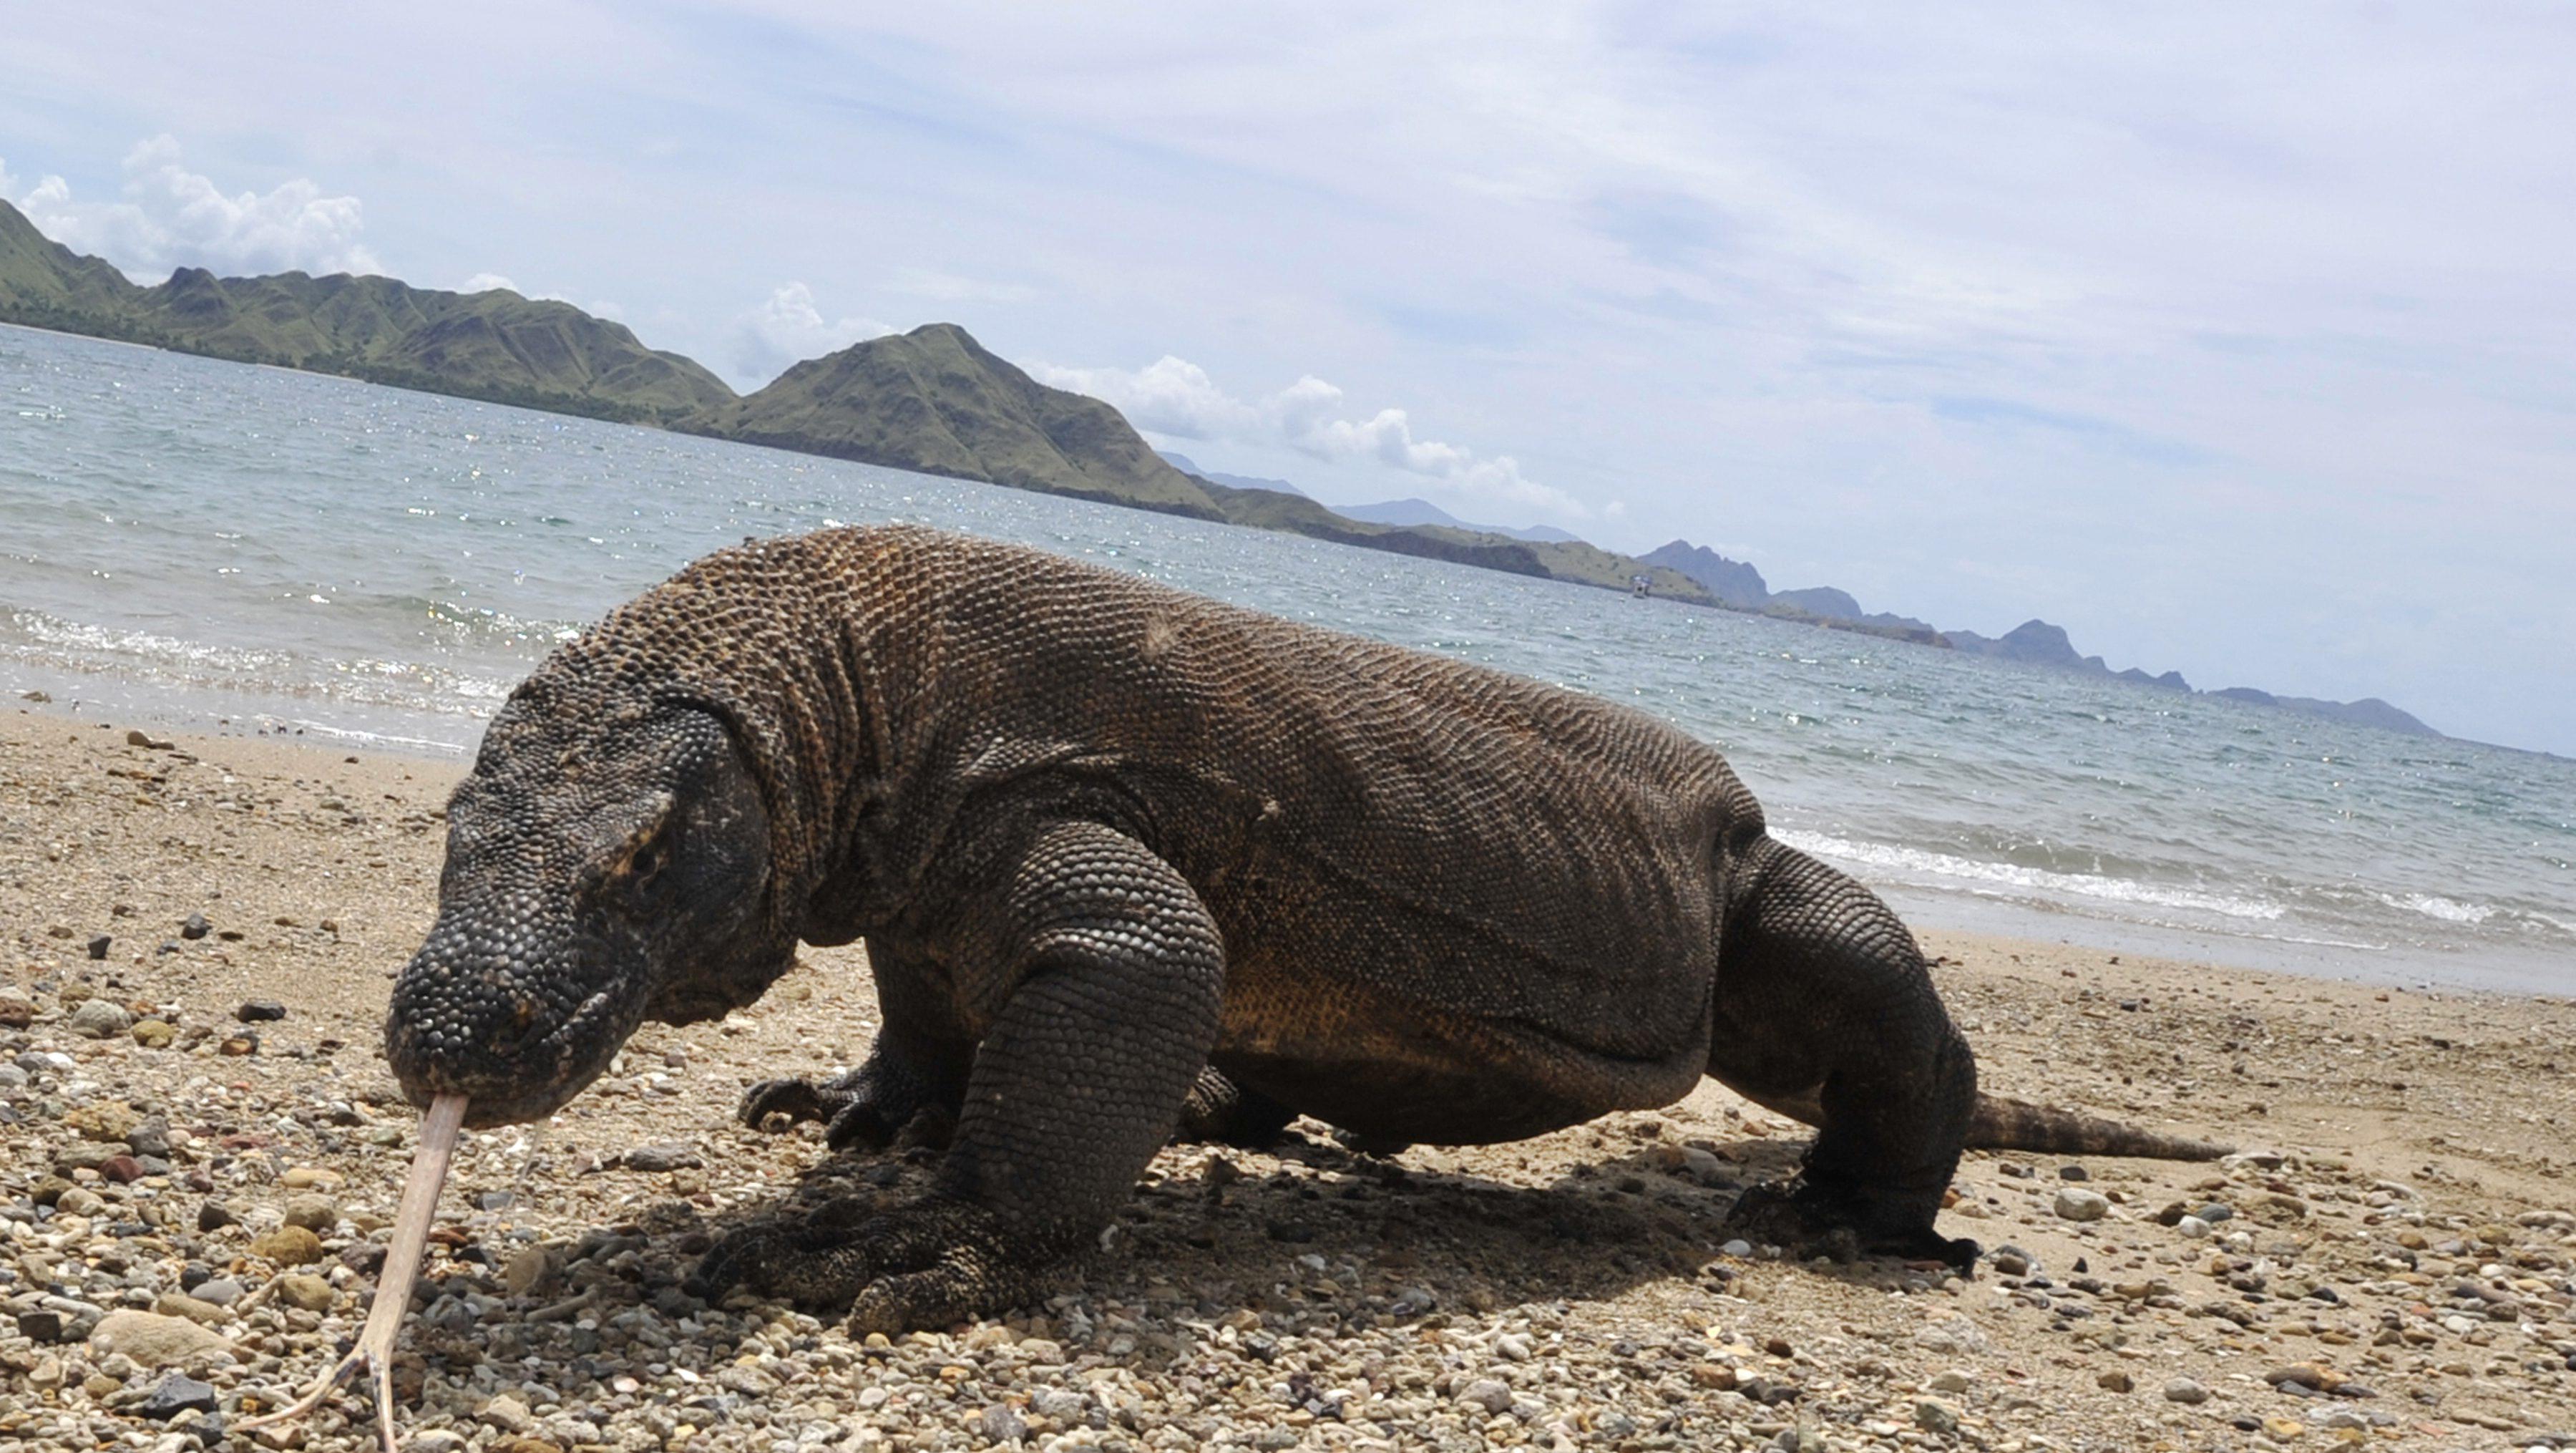 komodo dragons, where is komodo national park, are komodo dragons endangered